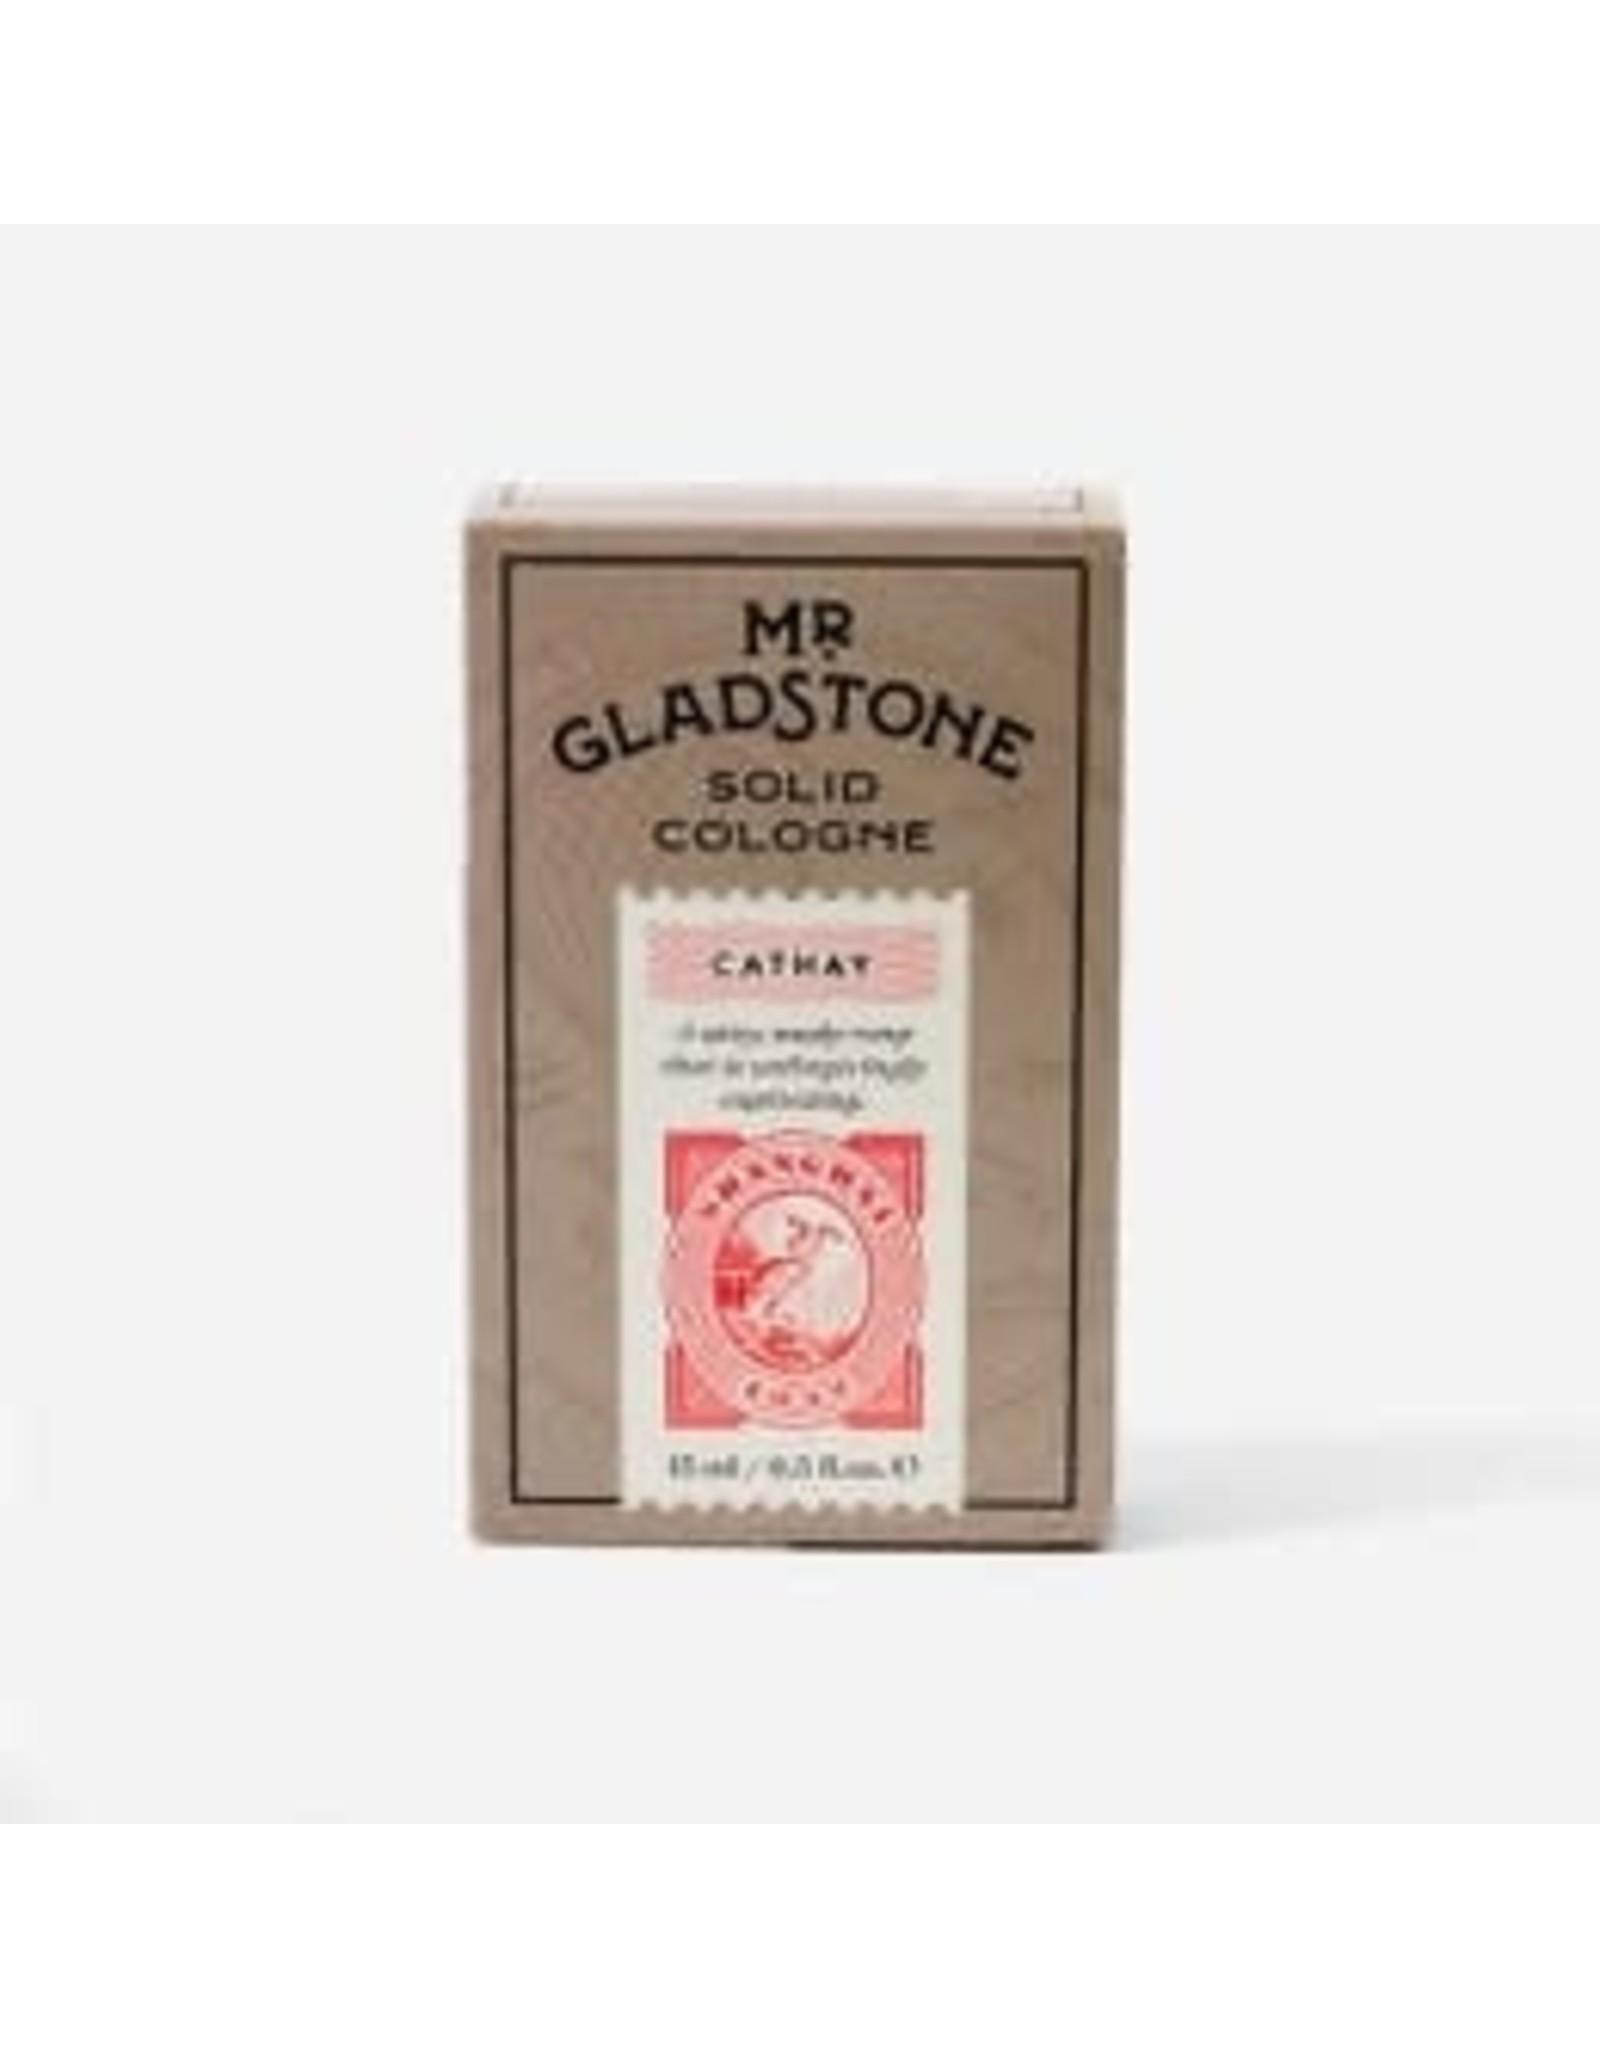 Mr Gladstone Mr Gladstone Solid Cologne - Cathay